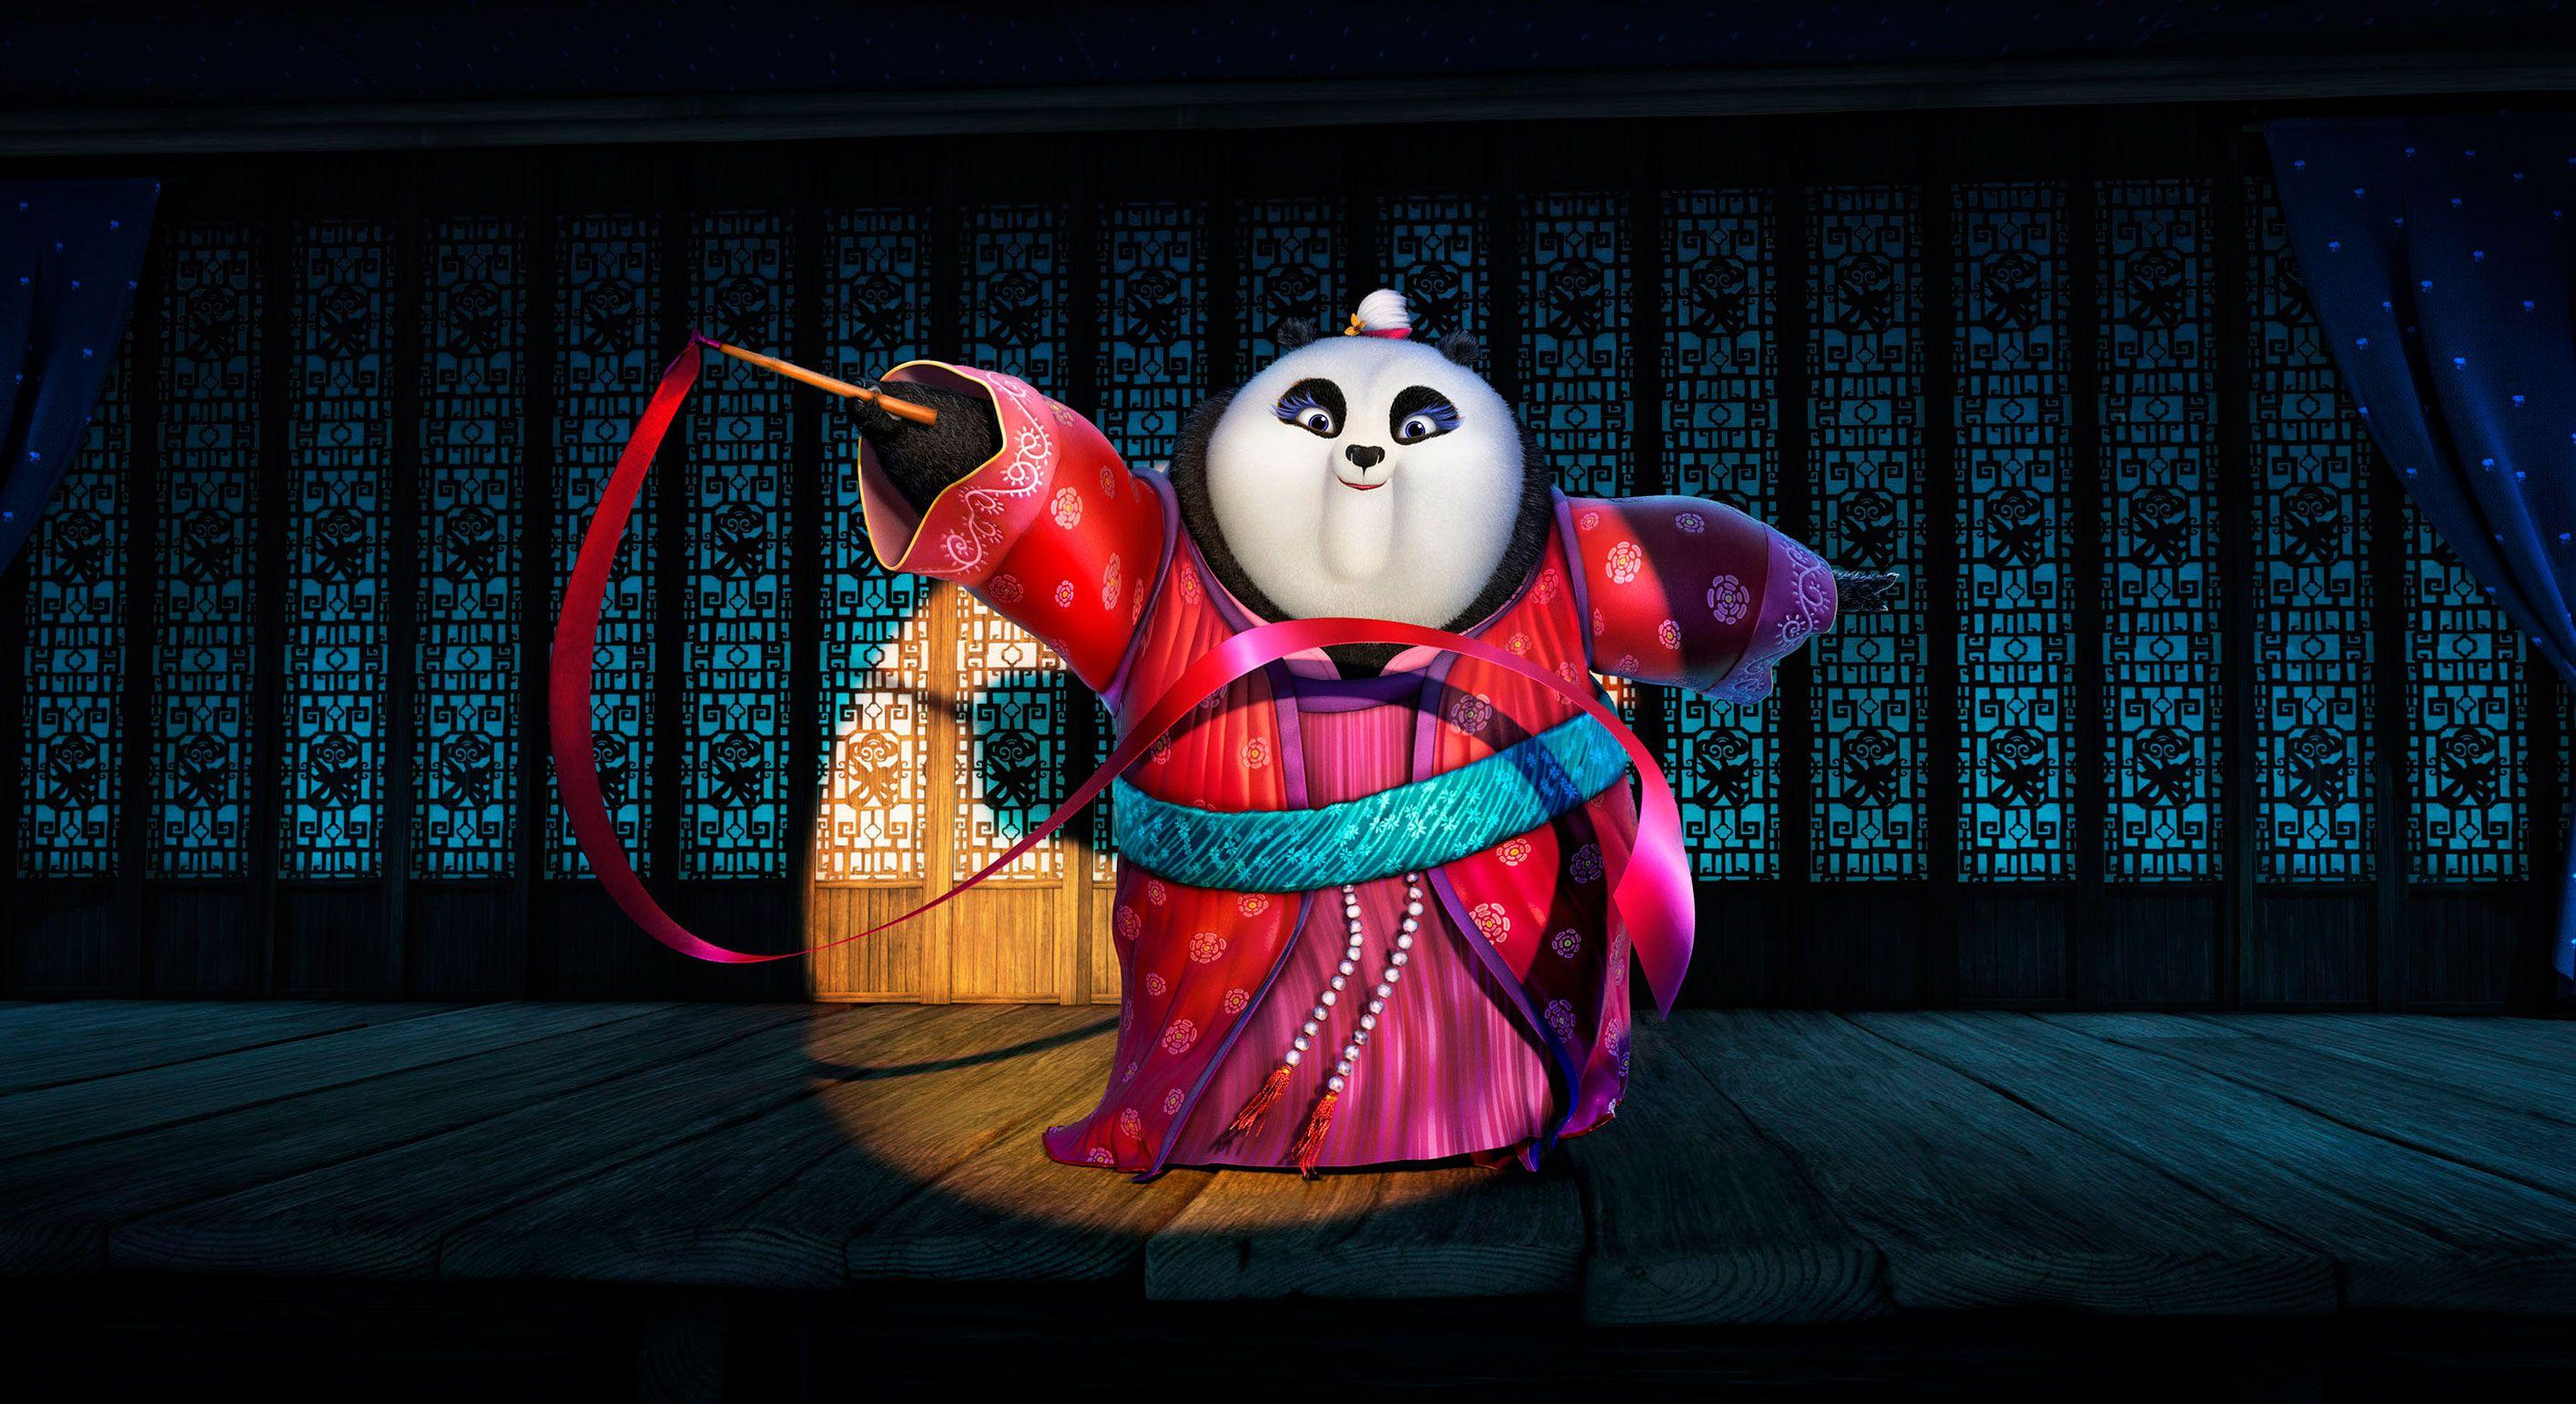 Kung Fu Panda Holiday Movies Online Pinterest Kung Fu Kung Fu Panda 3 Kung Fu Panda Panda Movies